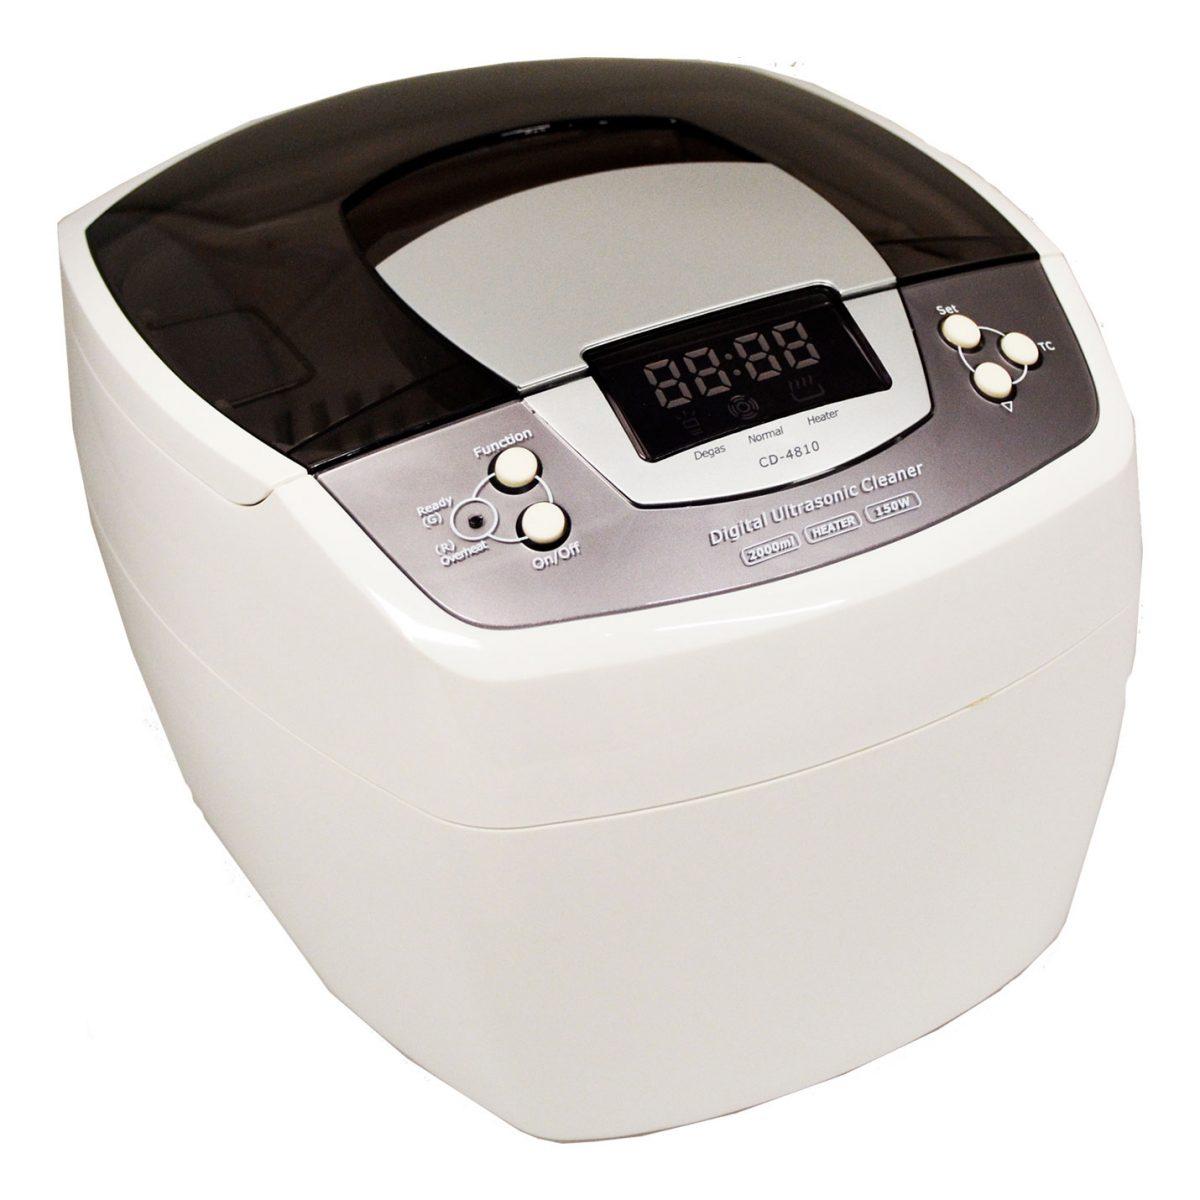 Digital Ultrasonic Cleaner